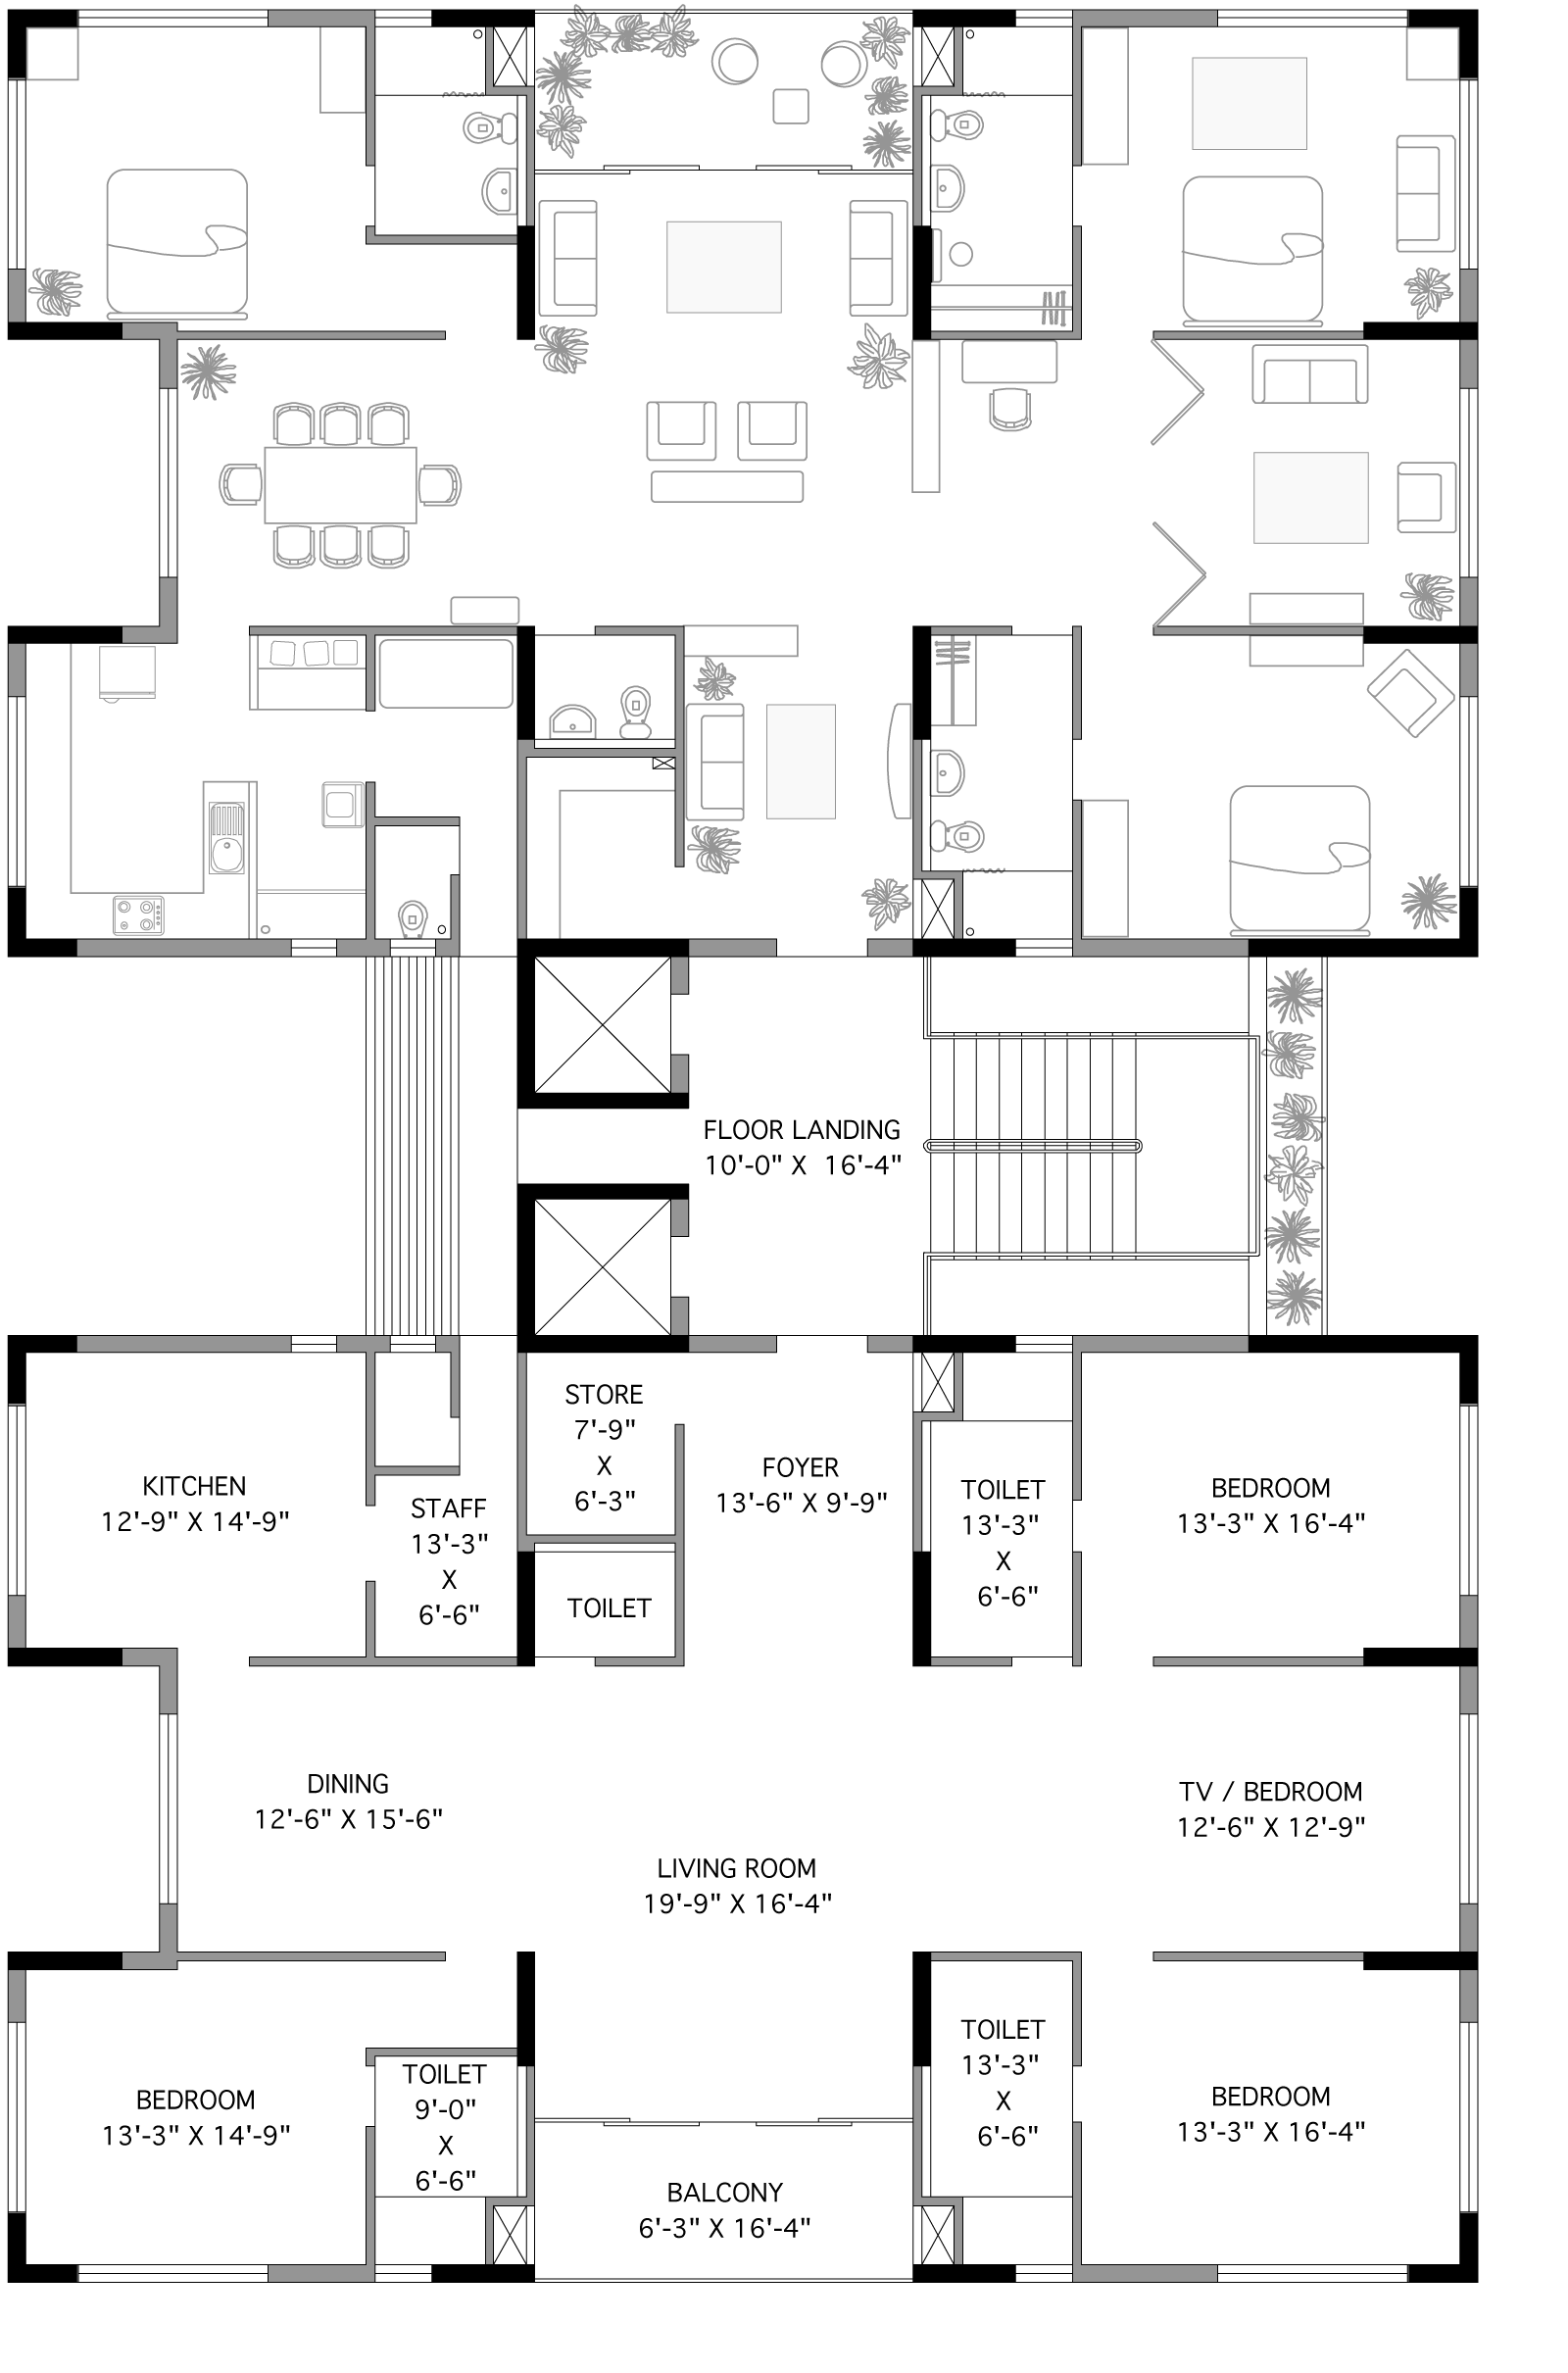 Floor Plan Of Gurdwara besides EP0272799A1 in addition Floor Plan Of Gurdwara moreover Floor Plan Styles further  on storage in woodbury mn